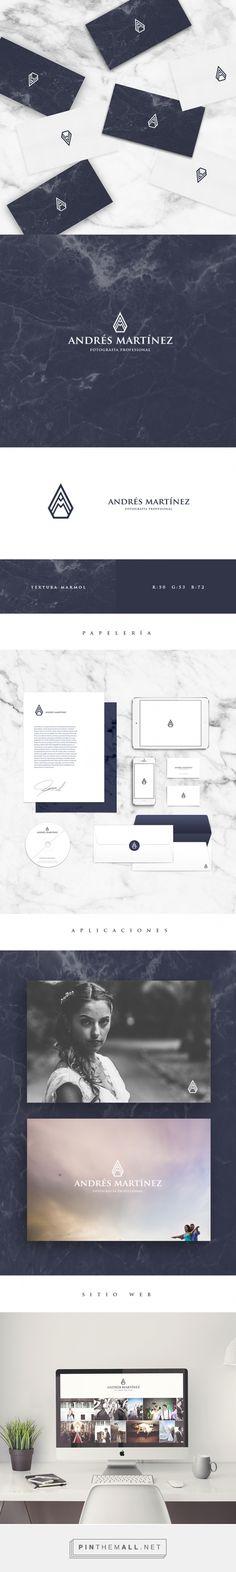 Andrés Martínez Branding on Behance   Fivestar Branding – Design and Branding Agency & Inspiration Gallery